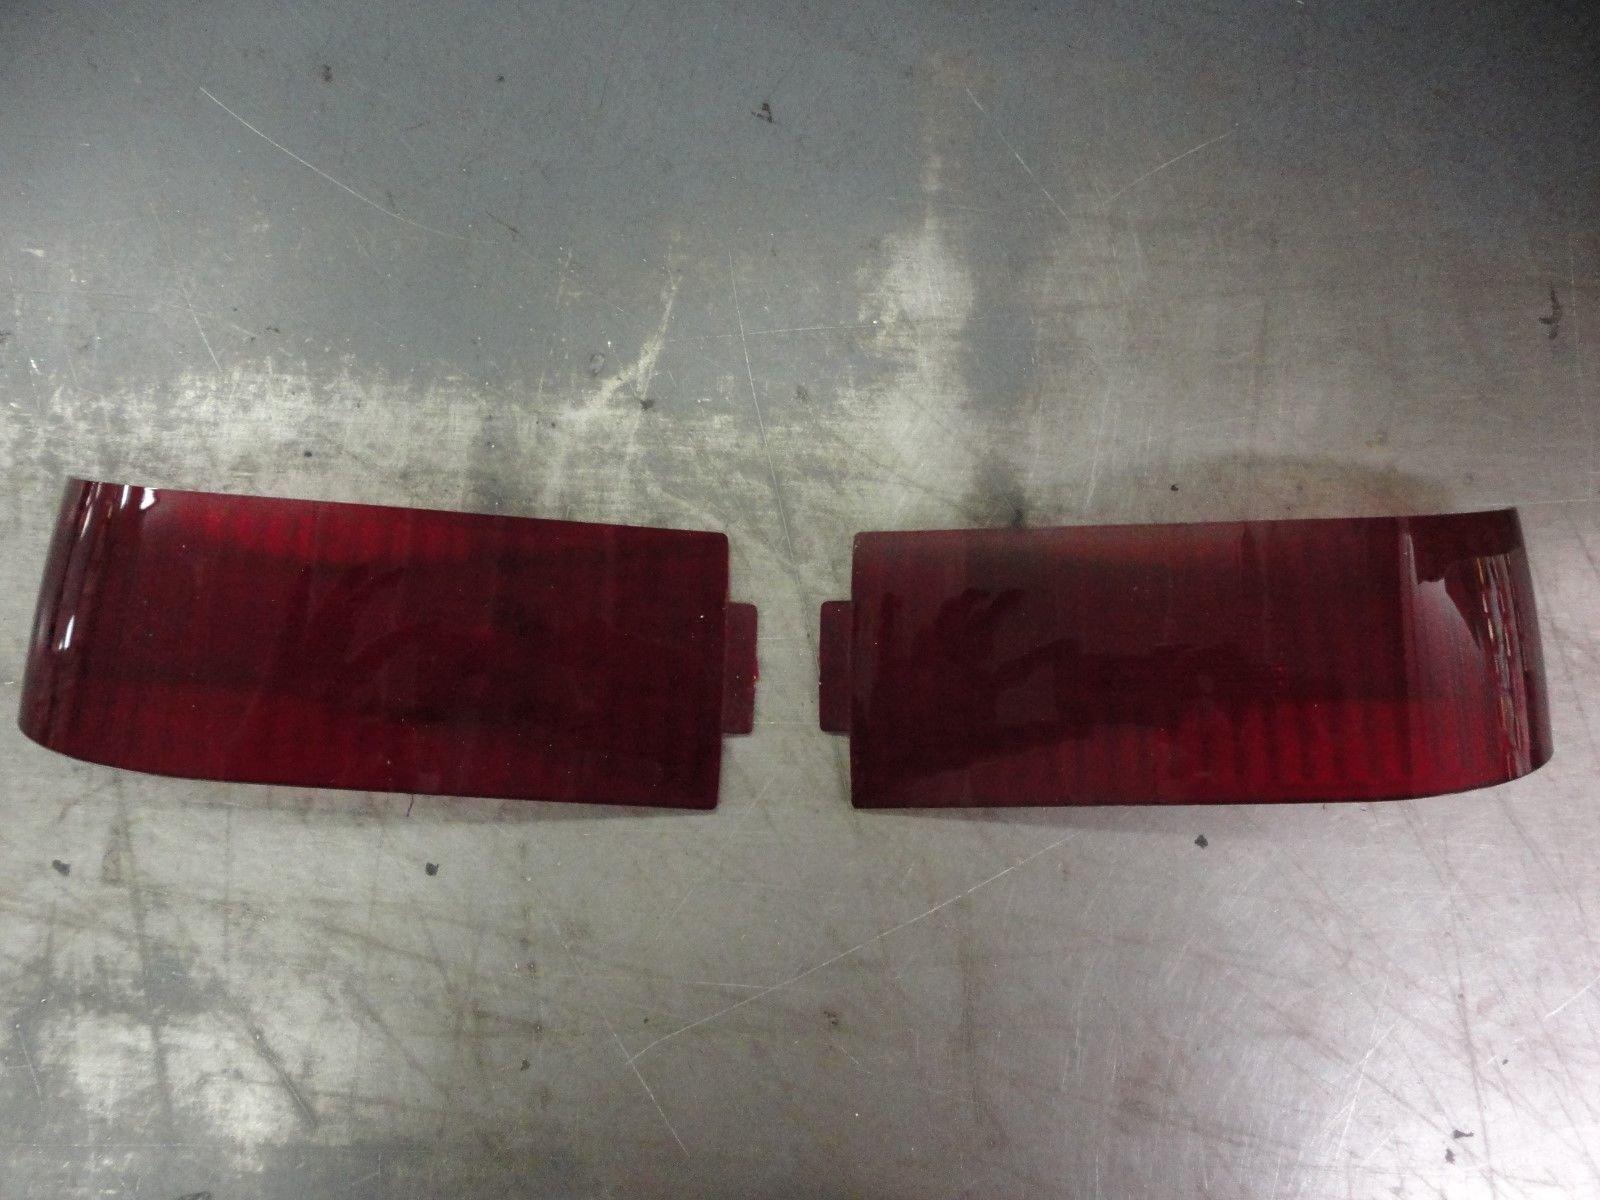 NEW Replacement John Deere Genuine OEM Rear Tail Light Lens Set M116504 M116505 415 425 445 455